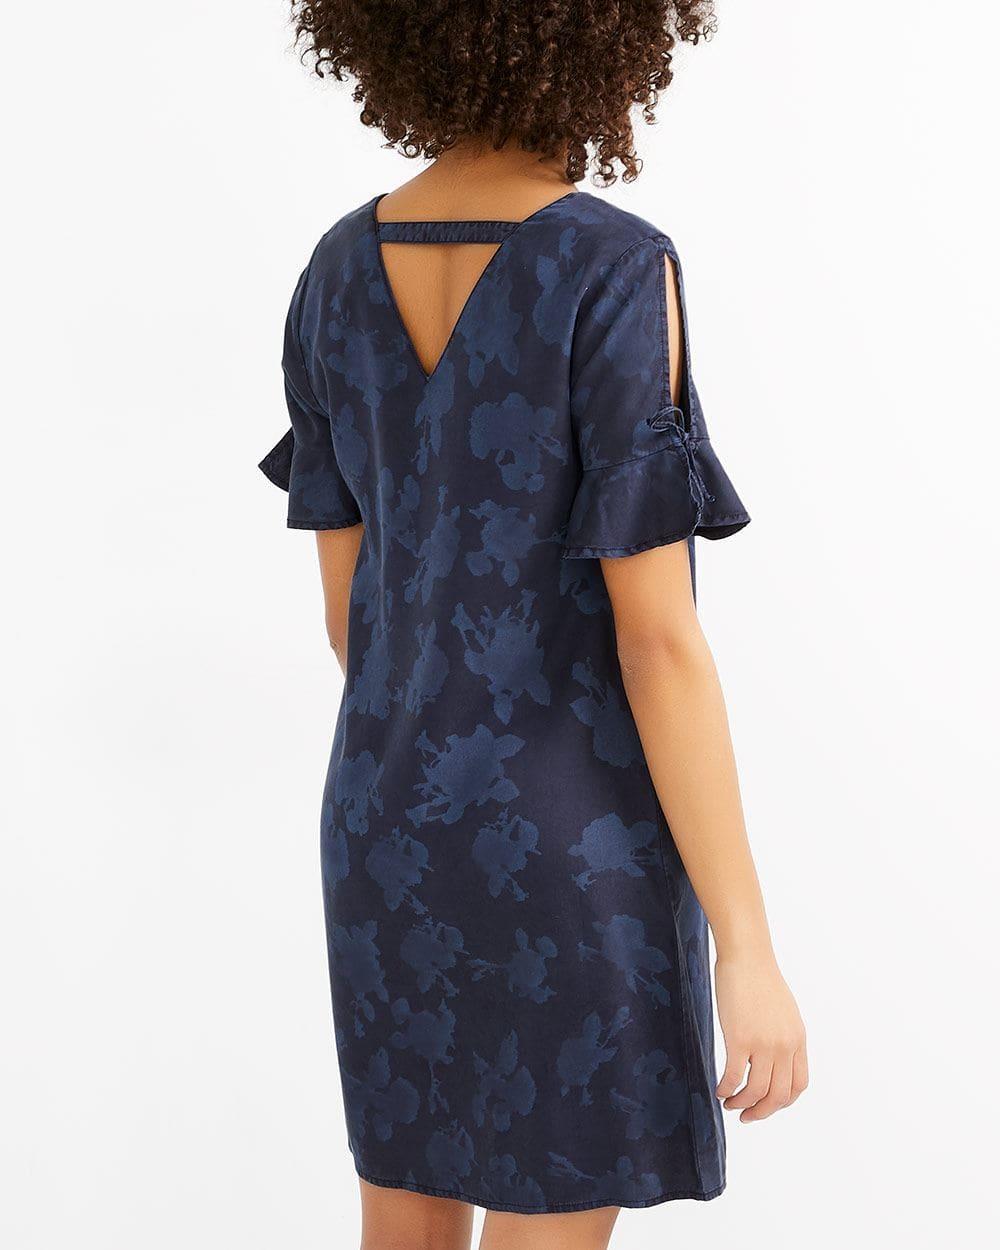 Ruffle Sleeve Printed Shift Dress